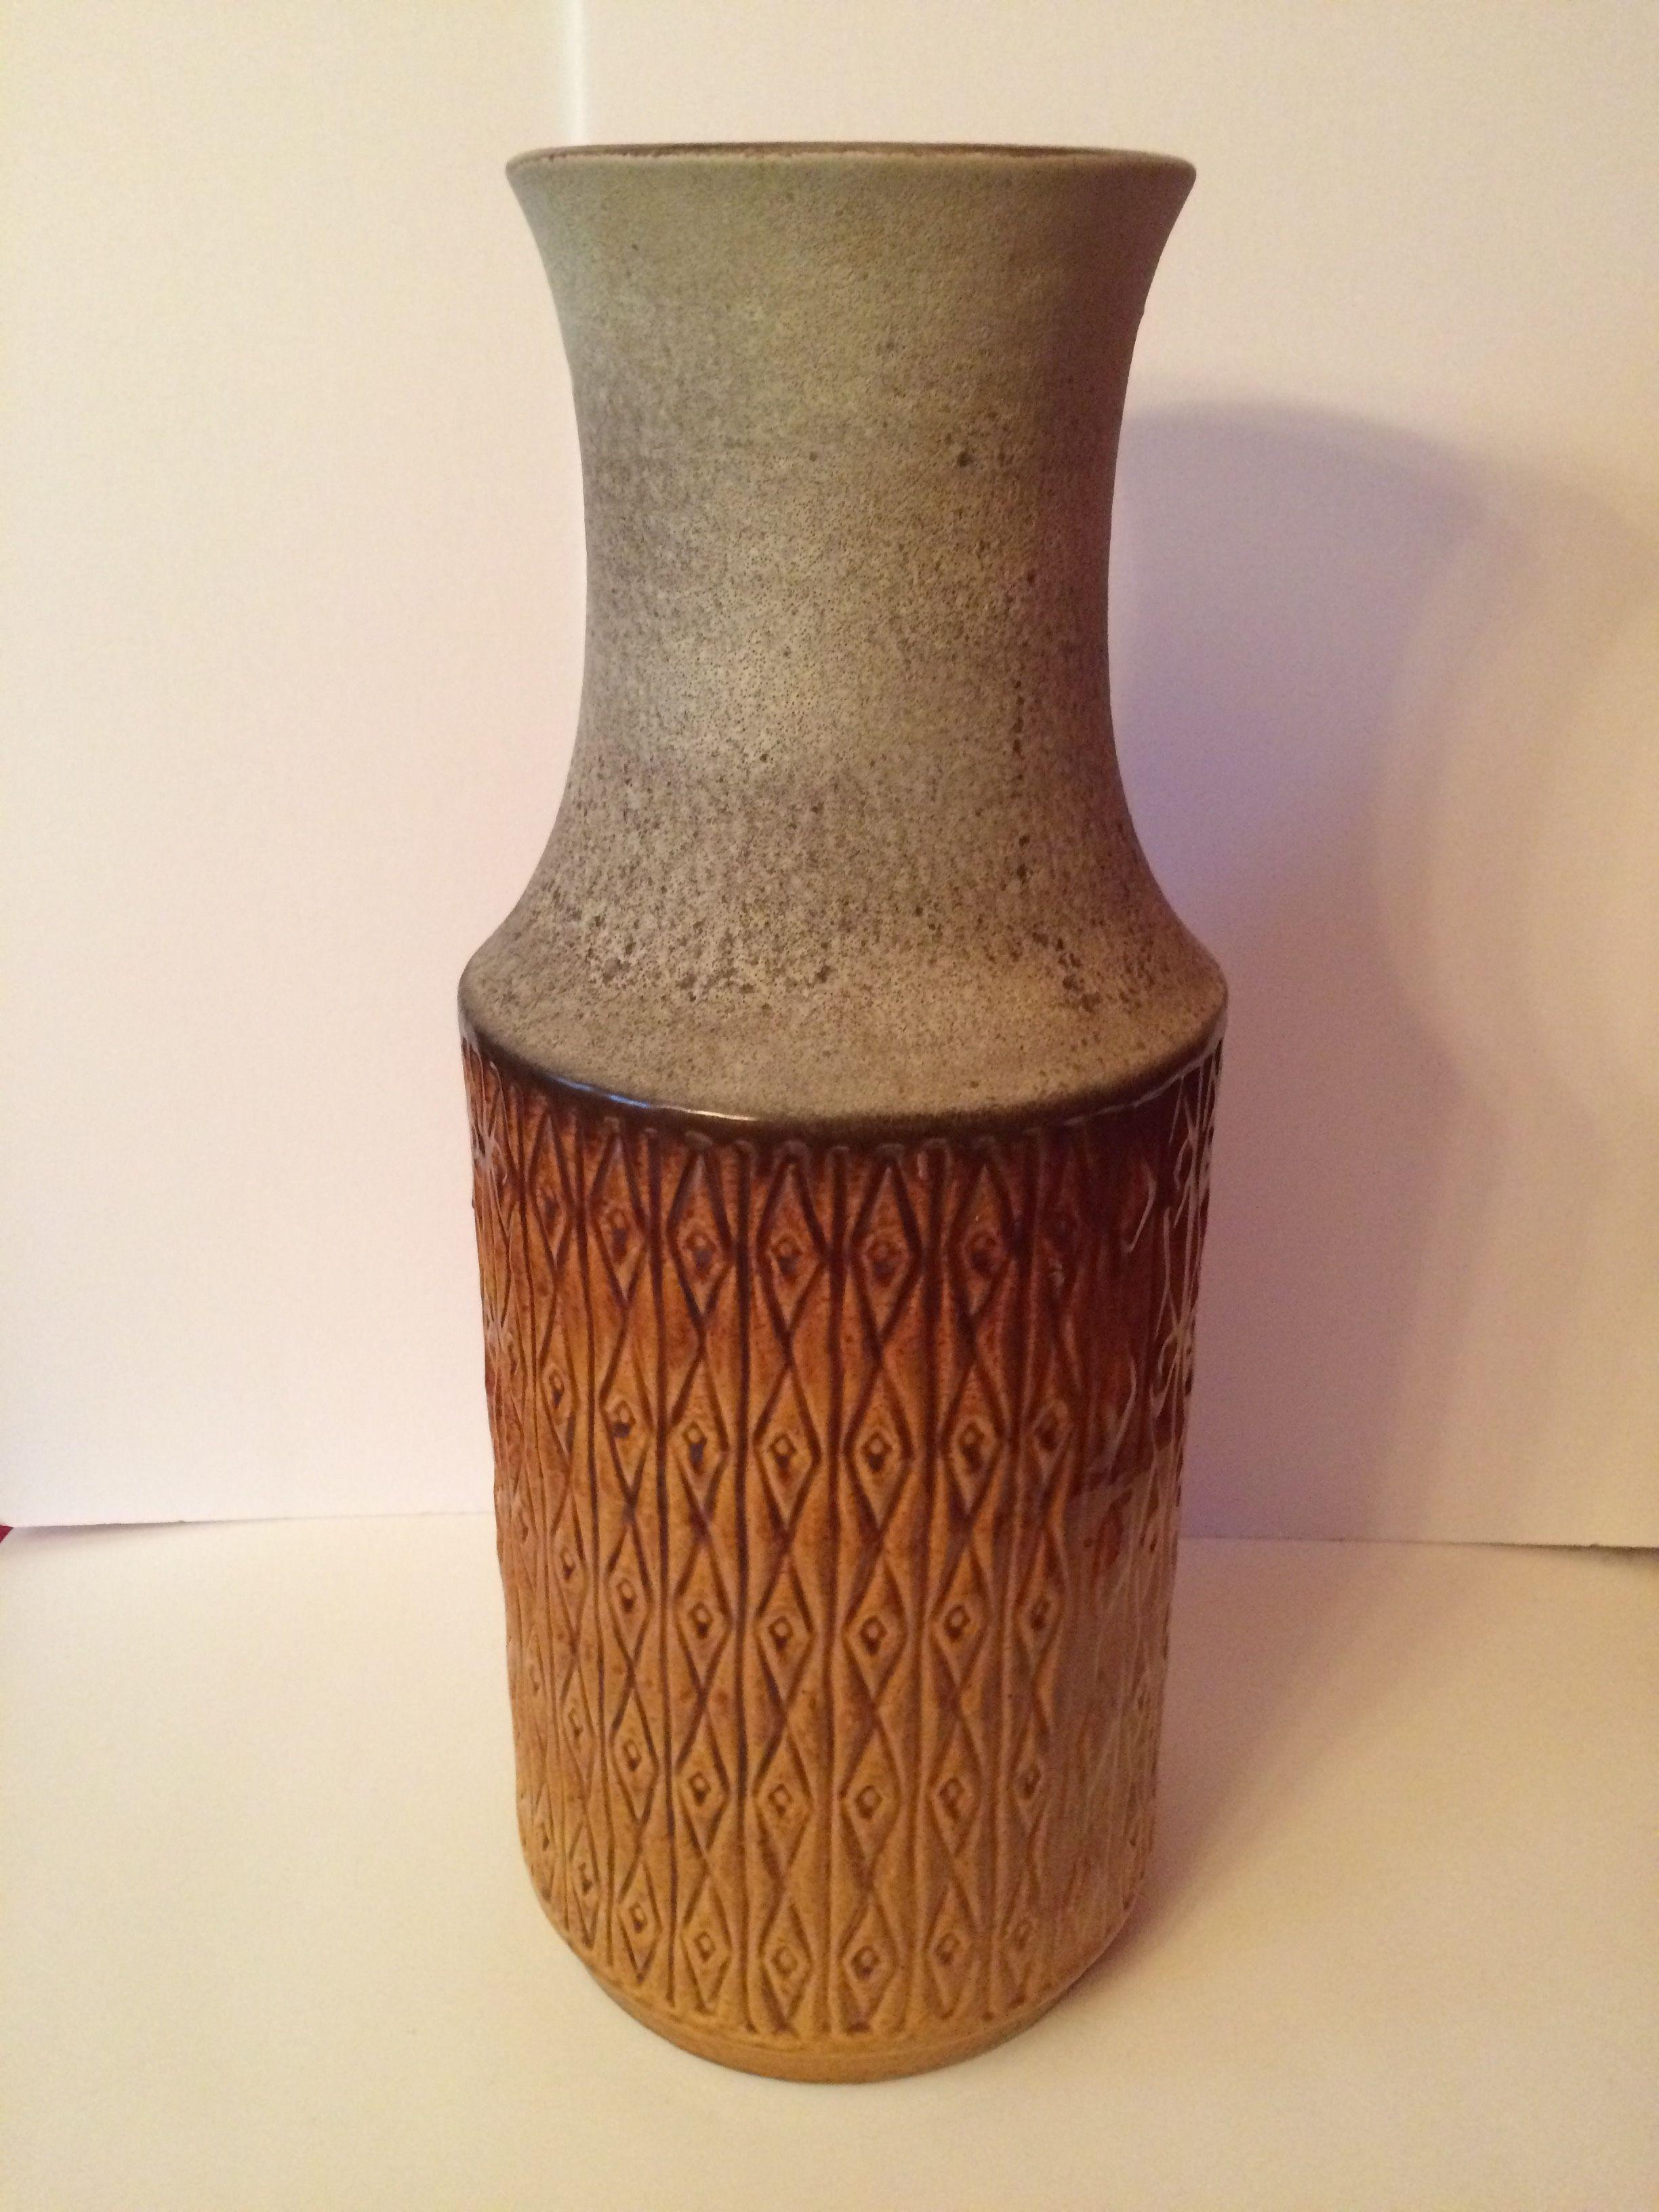 West german pottery floor vase carstens 7000 50 50 cm tall west west german pottery floor vase carstens 7000 50 50 cm tall reviewsmspy